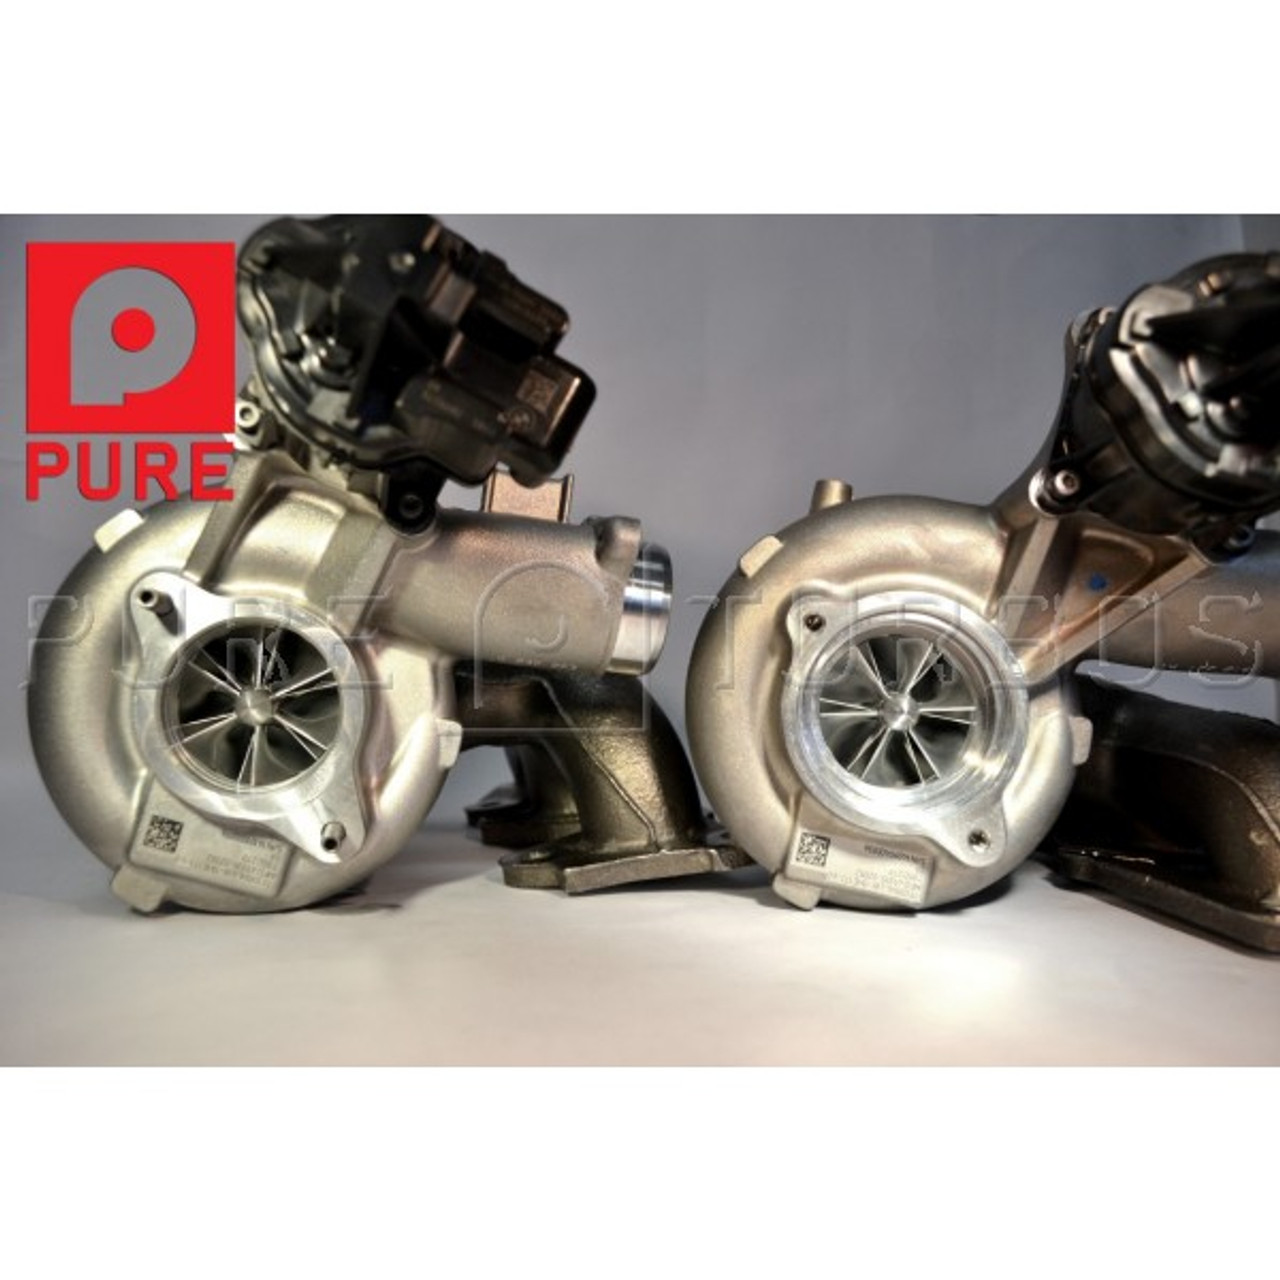 Bmw X6m Turbo Upgrade: Pure Turbos BMW M3 / M4 (F80 / F82) Stage 2 Turbo Upgrades